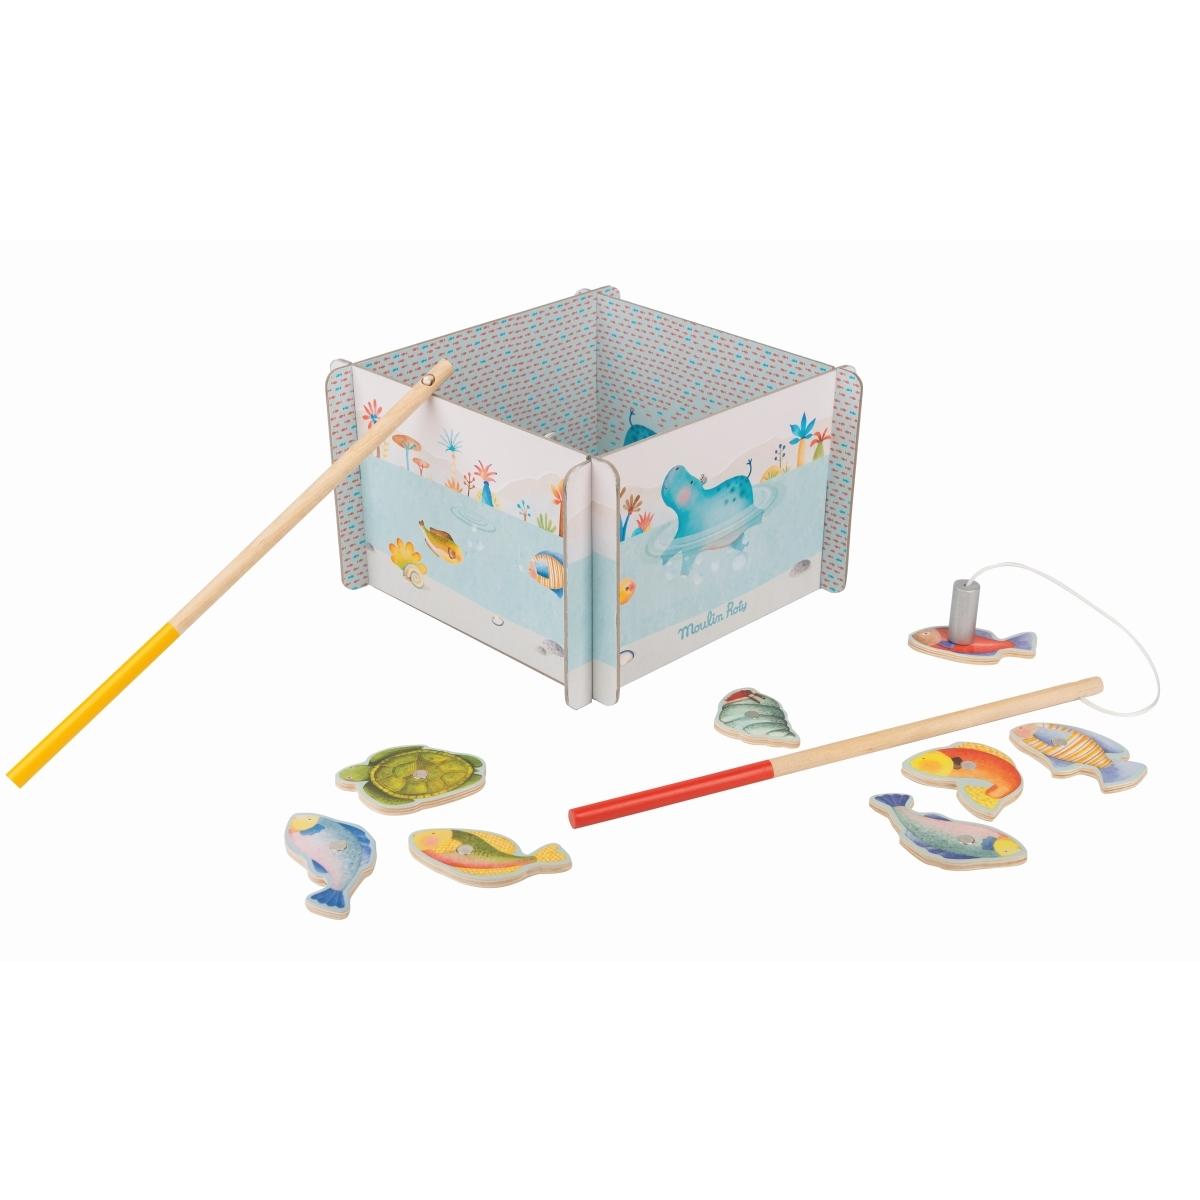 moulin roty angelspiel les papoum spielwaren ab 2 jahre spielzeug kind baby spielzeug. Black Bedroom Furniture Sets. Home Design Ideas